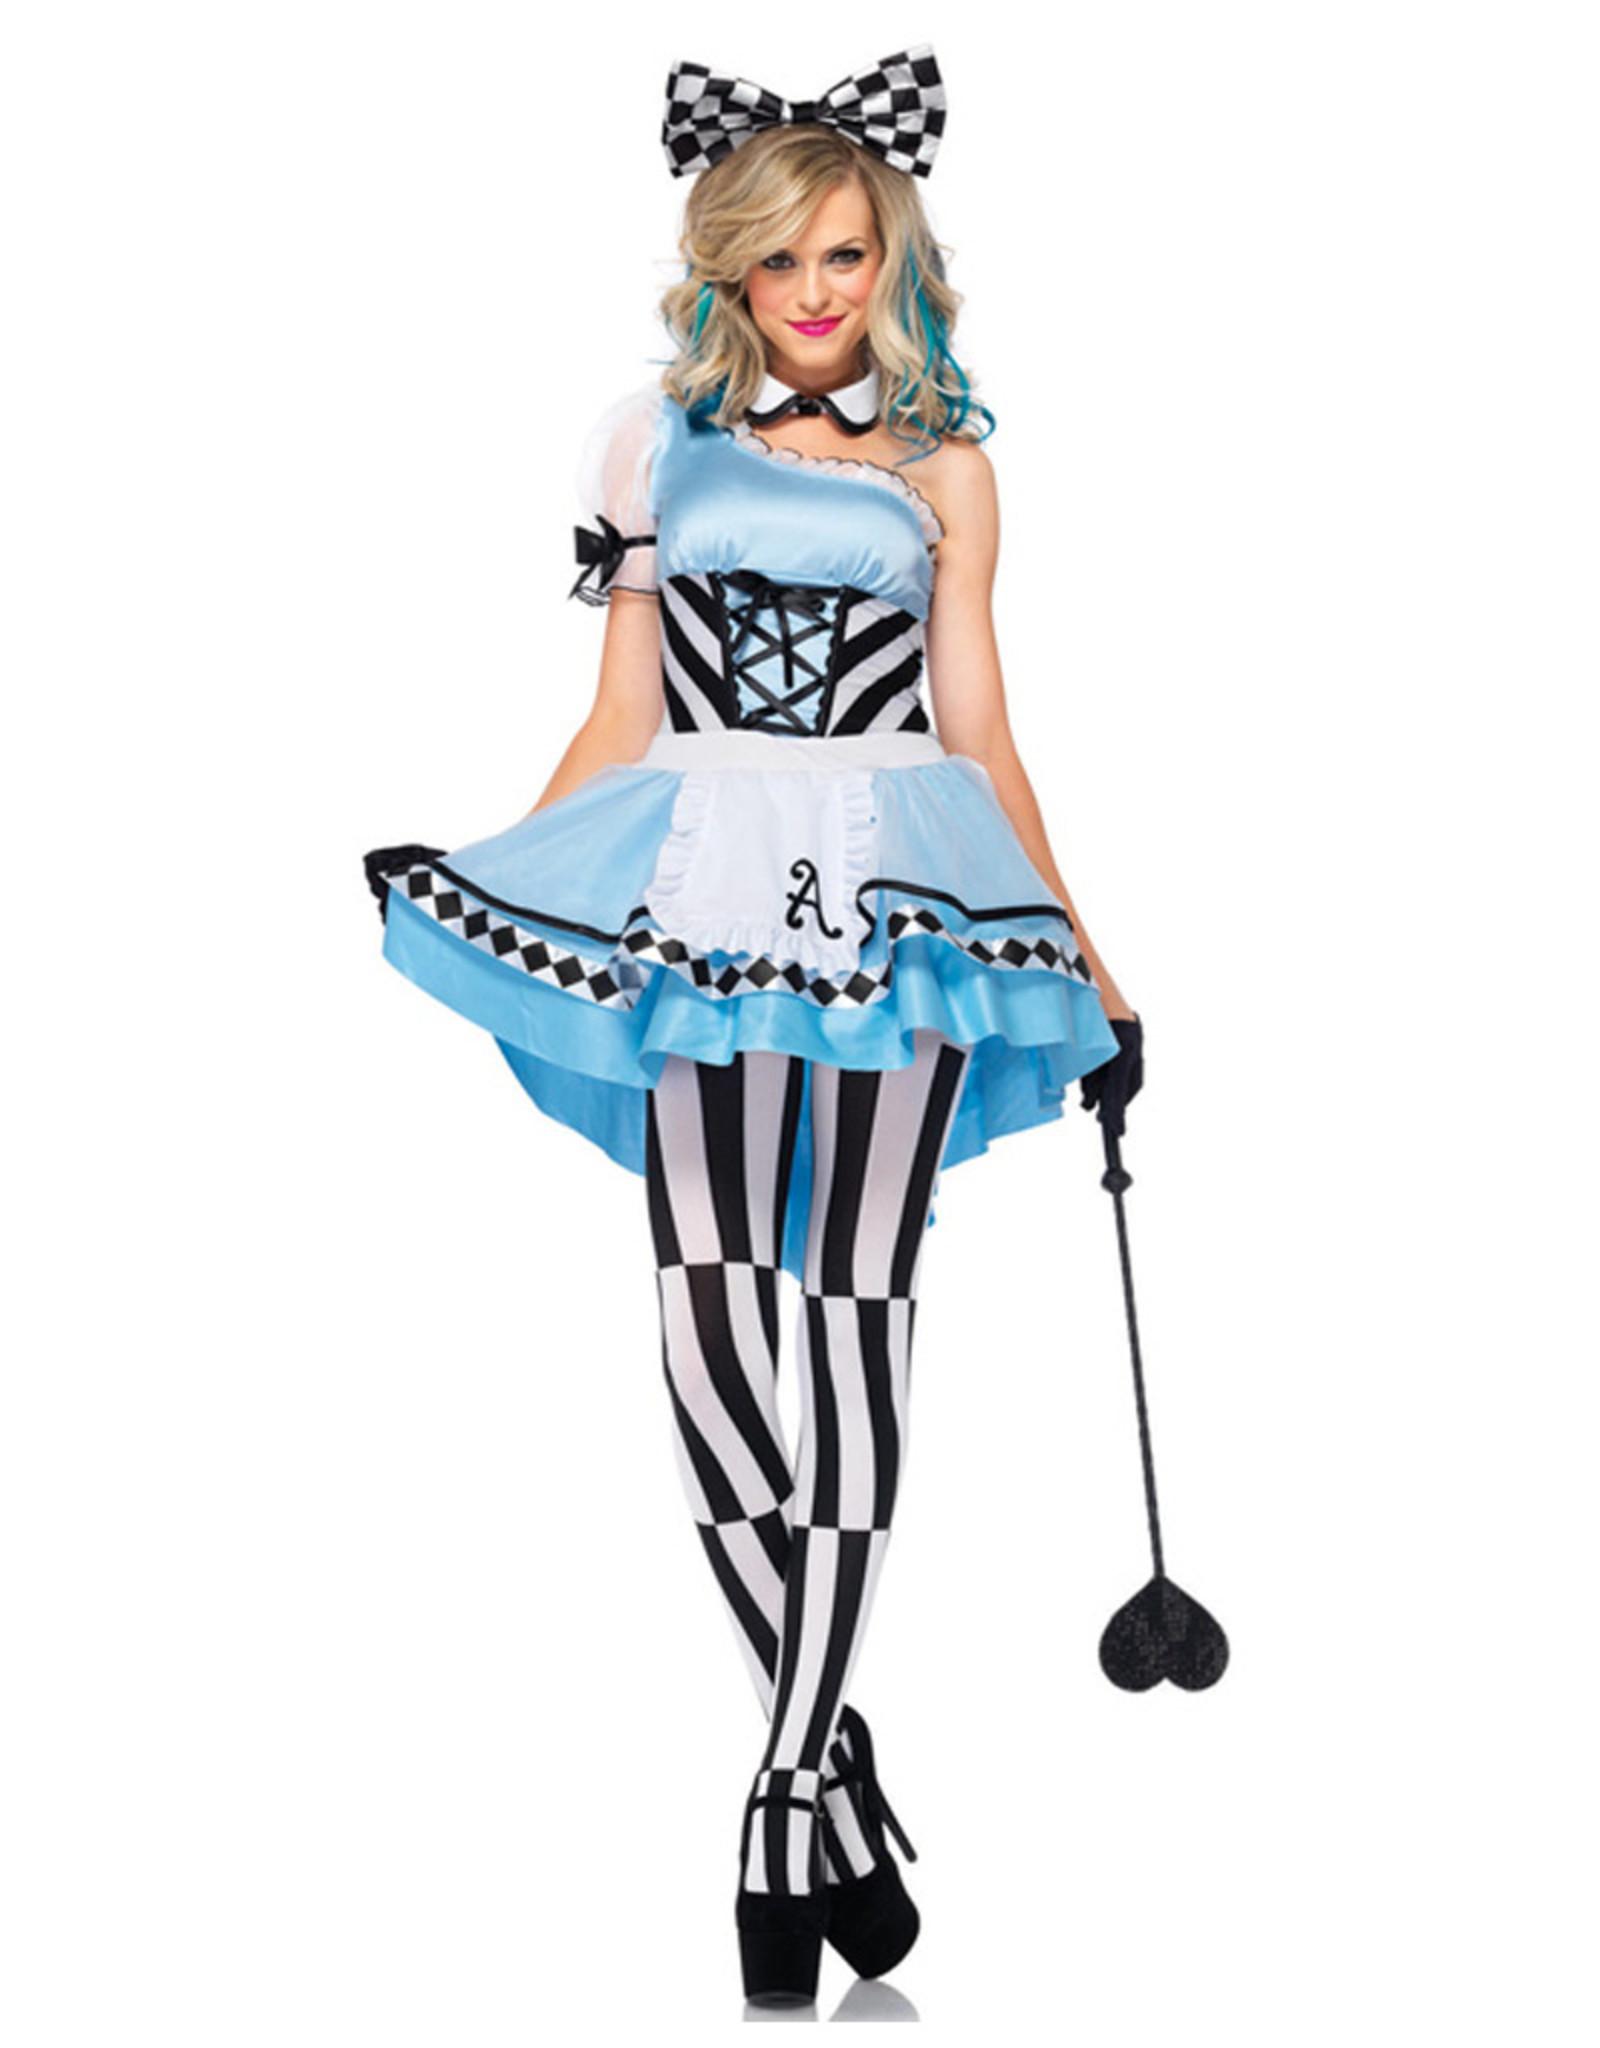 Psychedelic Alice Costume - Women's